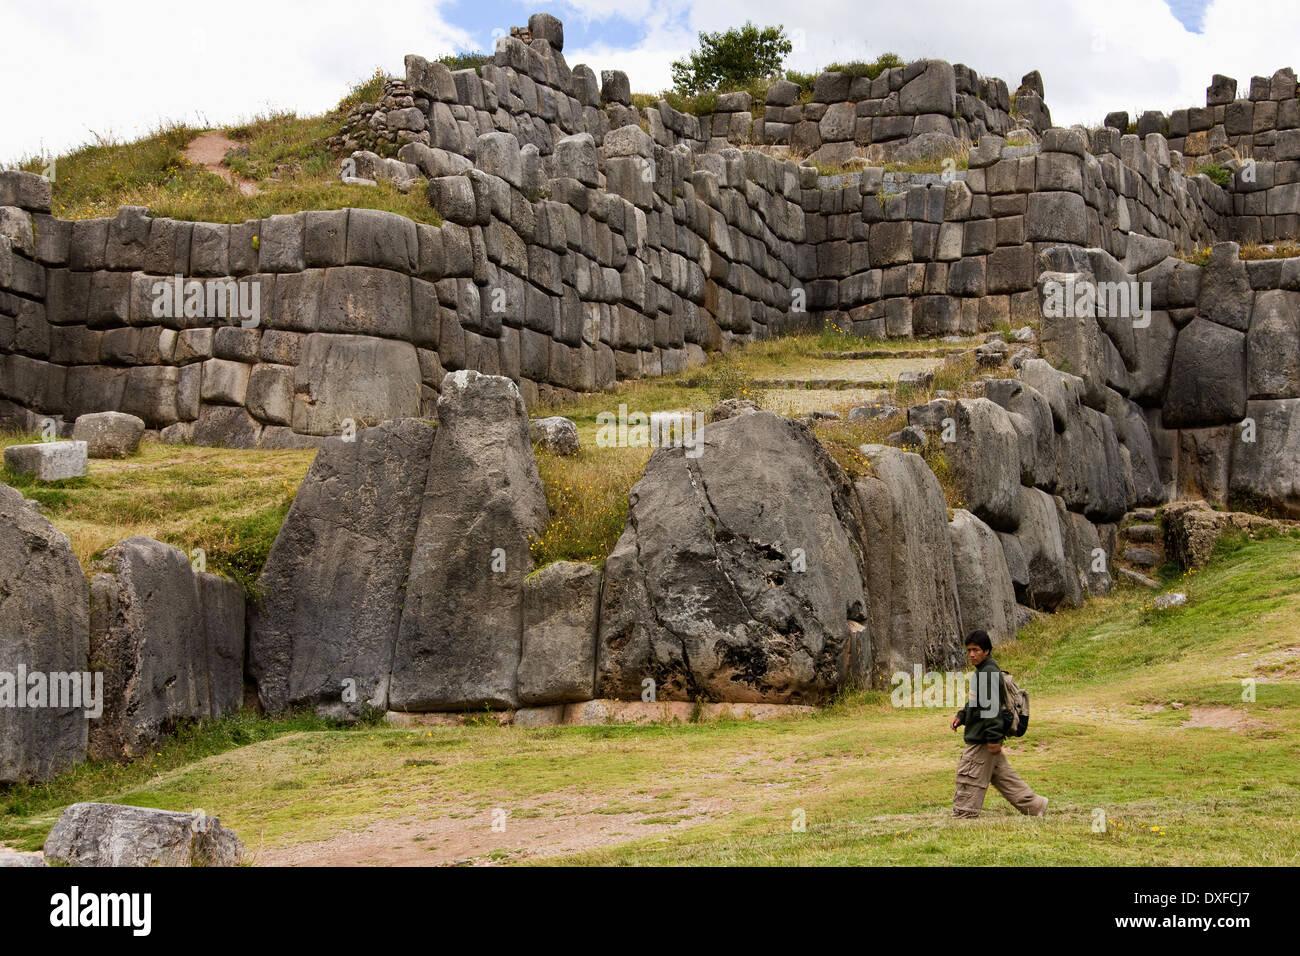 Inca stonework at Sacsayhuaman near Cuzco in Peru - Stock Image